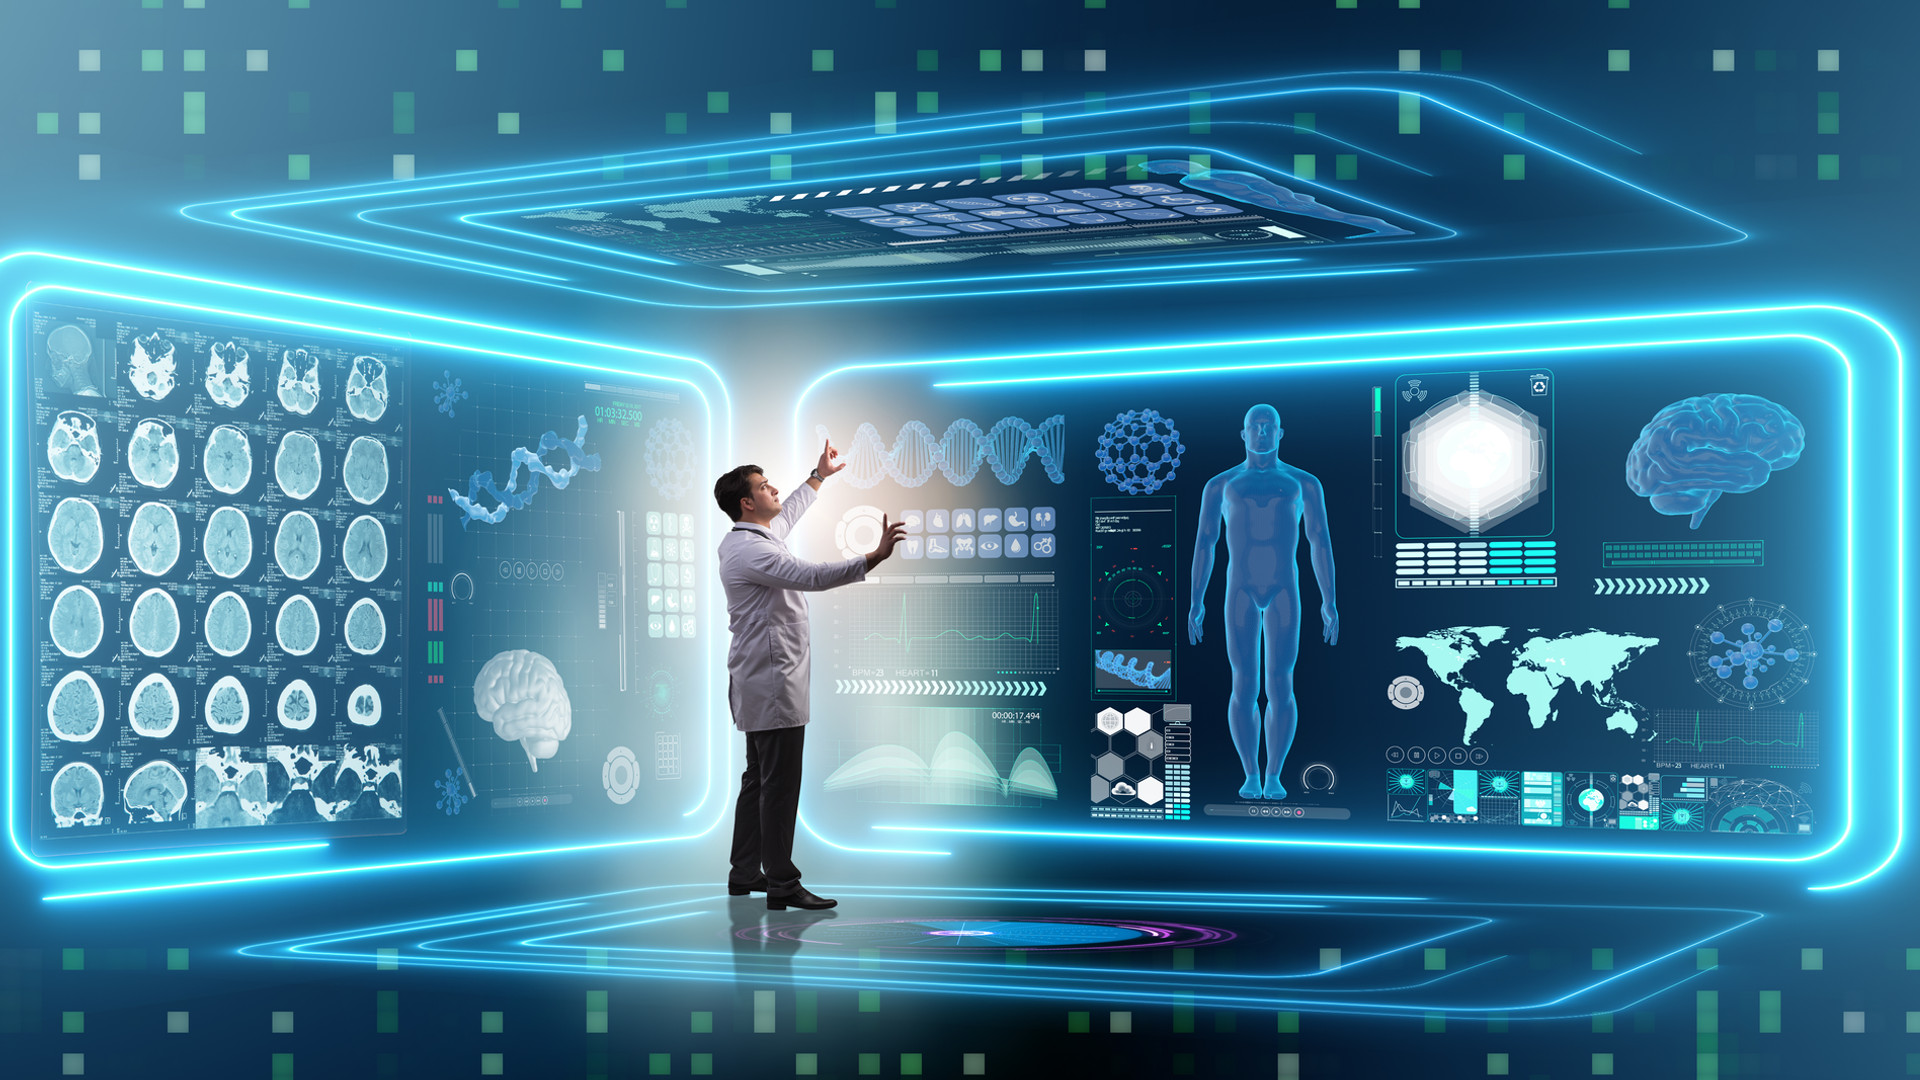 Man doctor in futuristic medicine medica